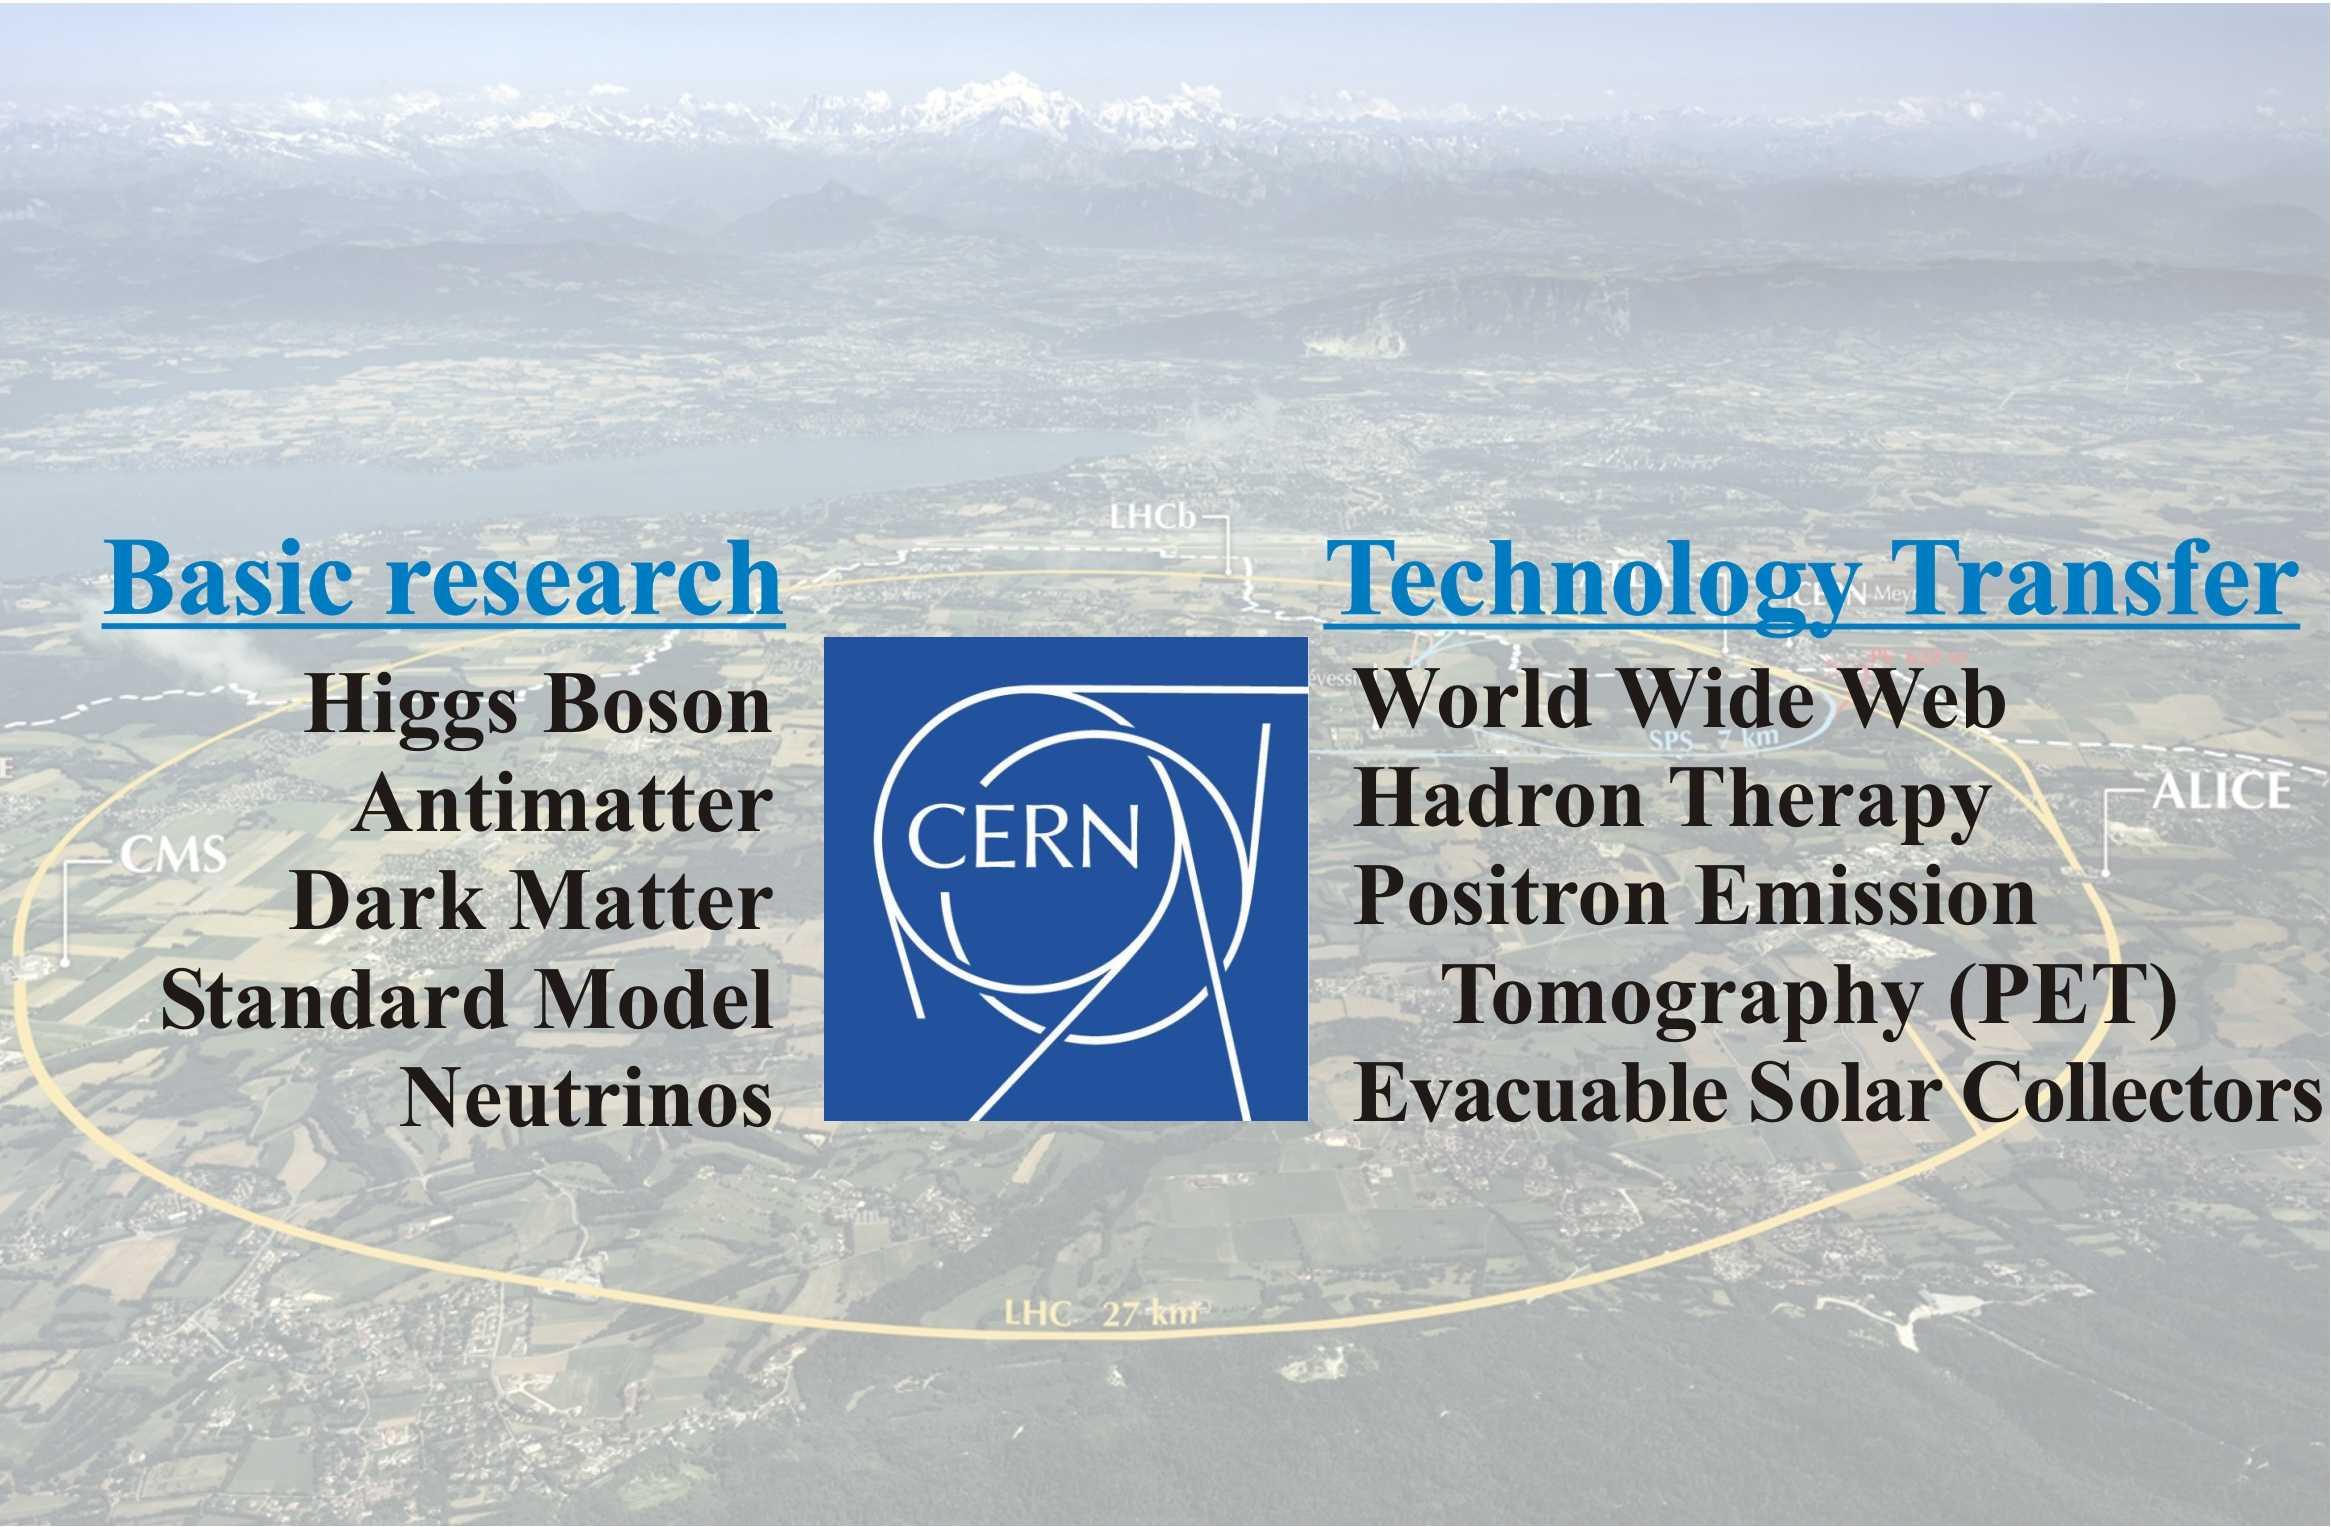 figures/CERN-BE-CO-HT/CERN_intro_1.jpg